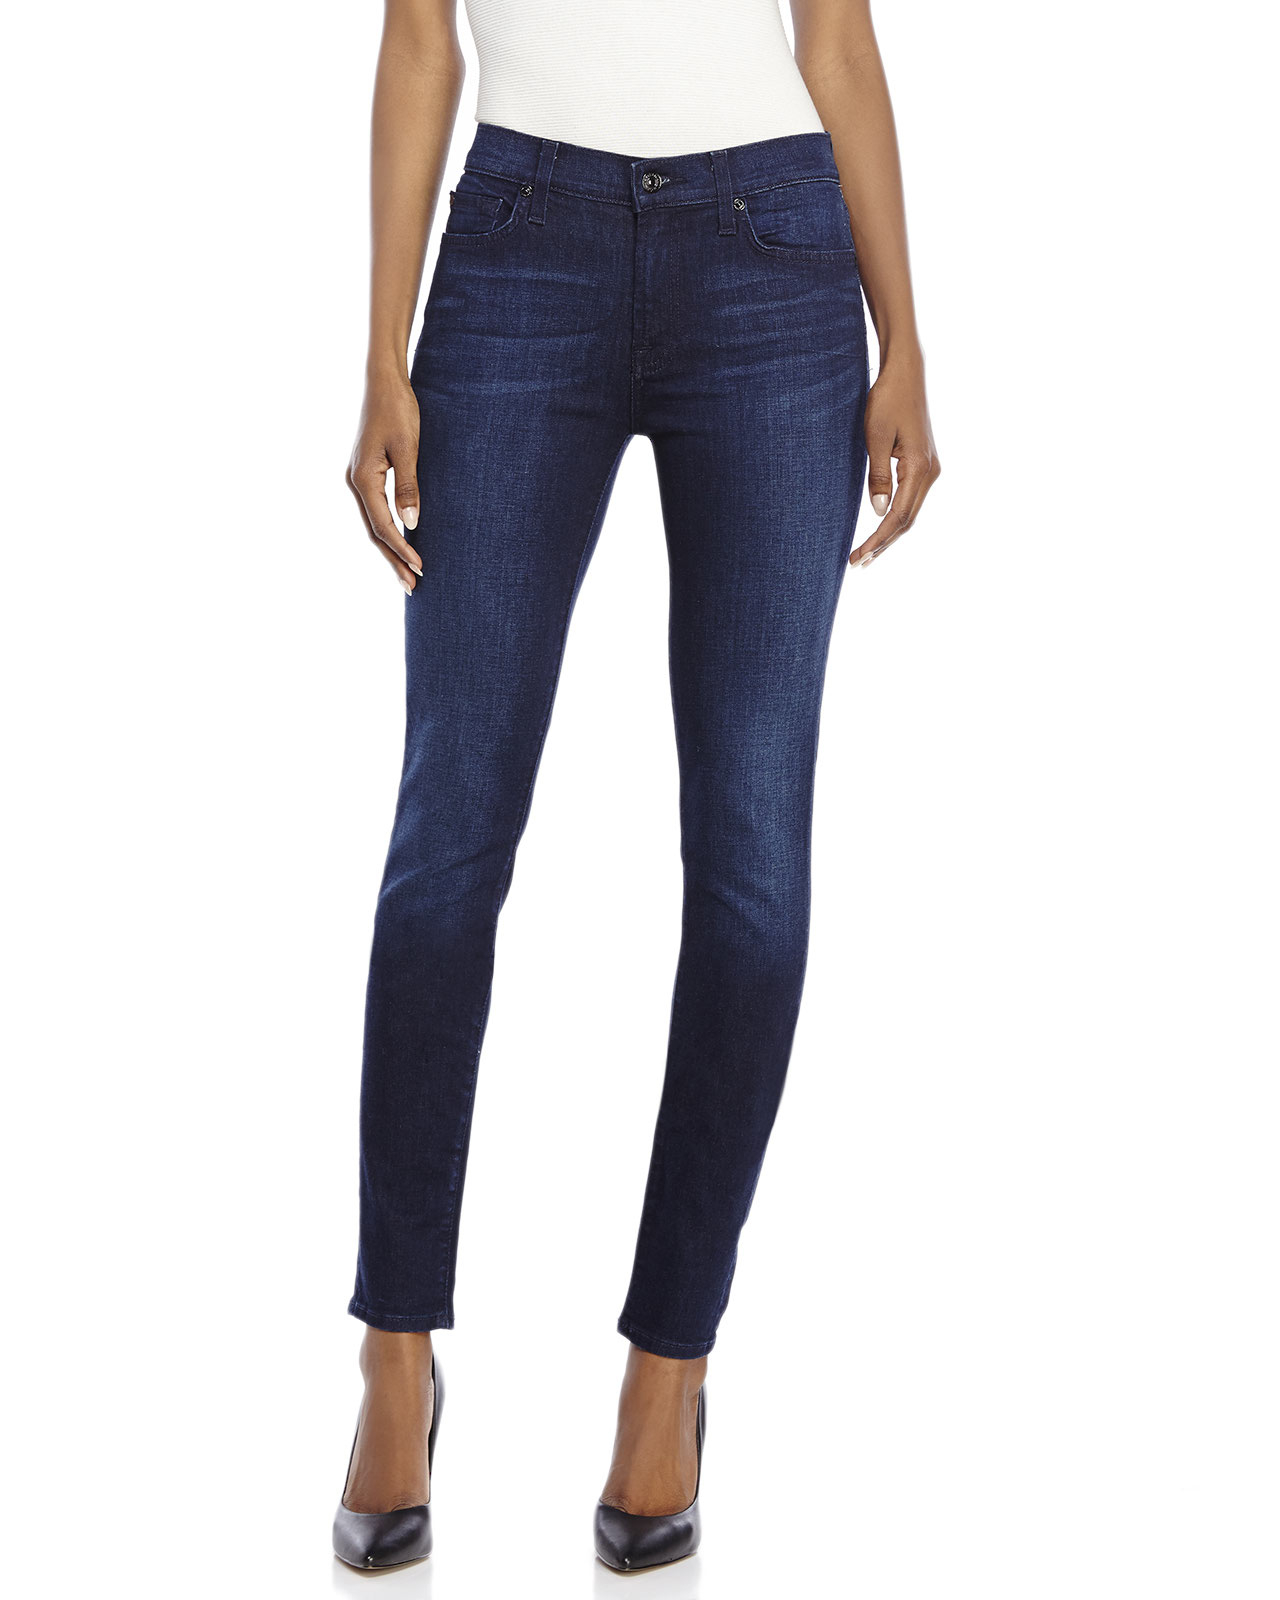 for all mankind gwenevere super skinny jeans in blue lyst. Black Bedroom Furniture Sets. Home Design Ideas